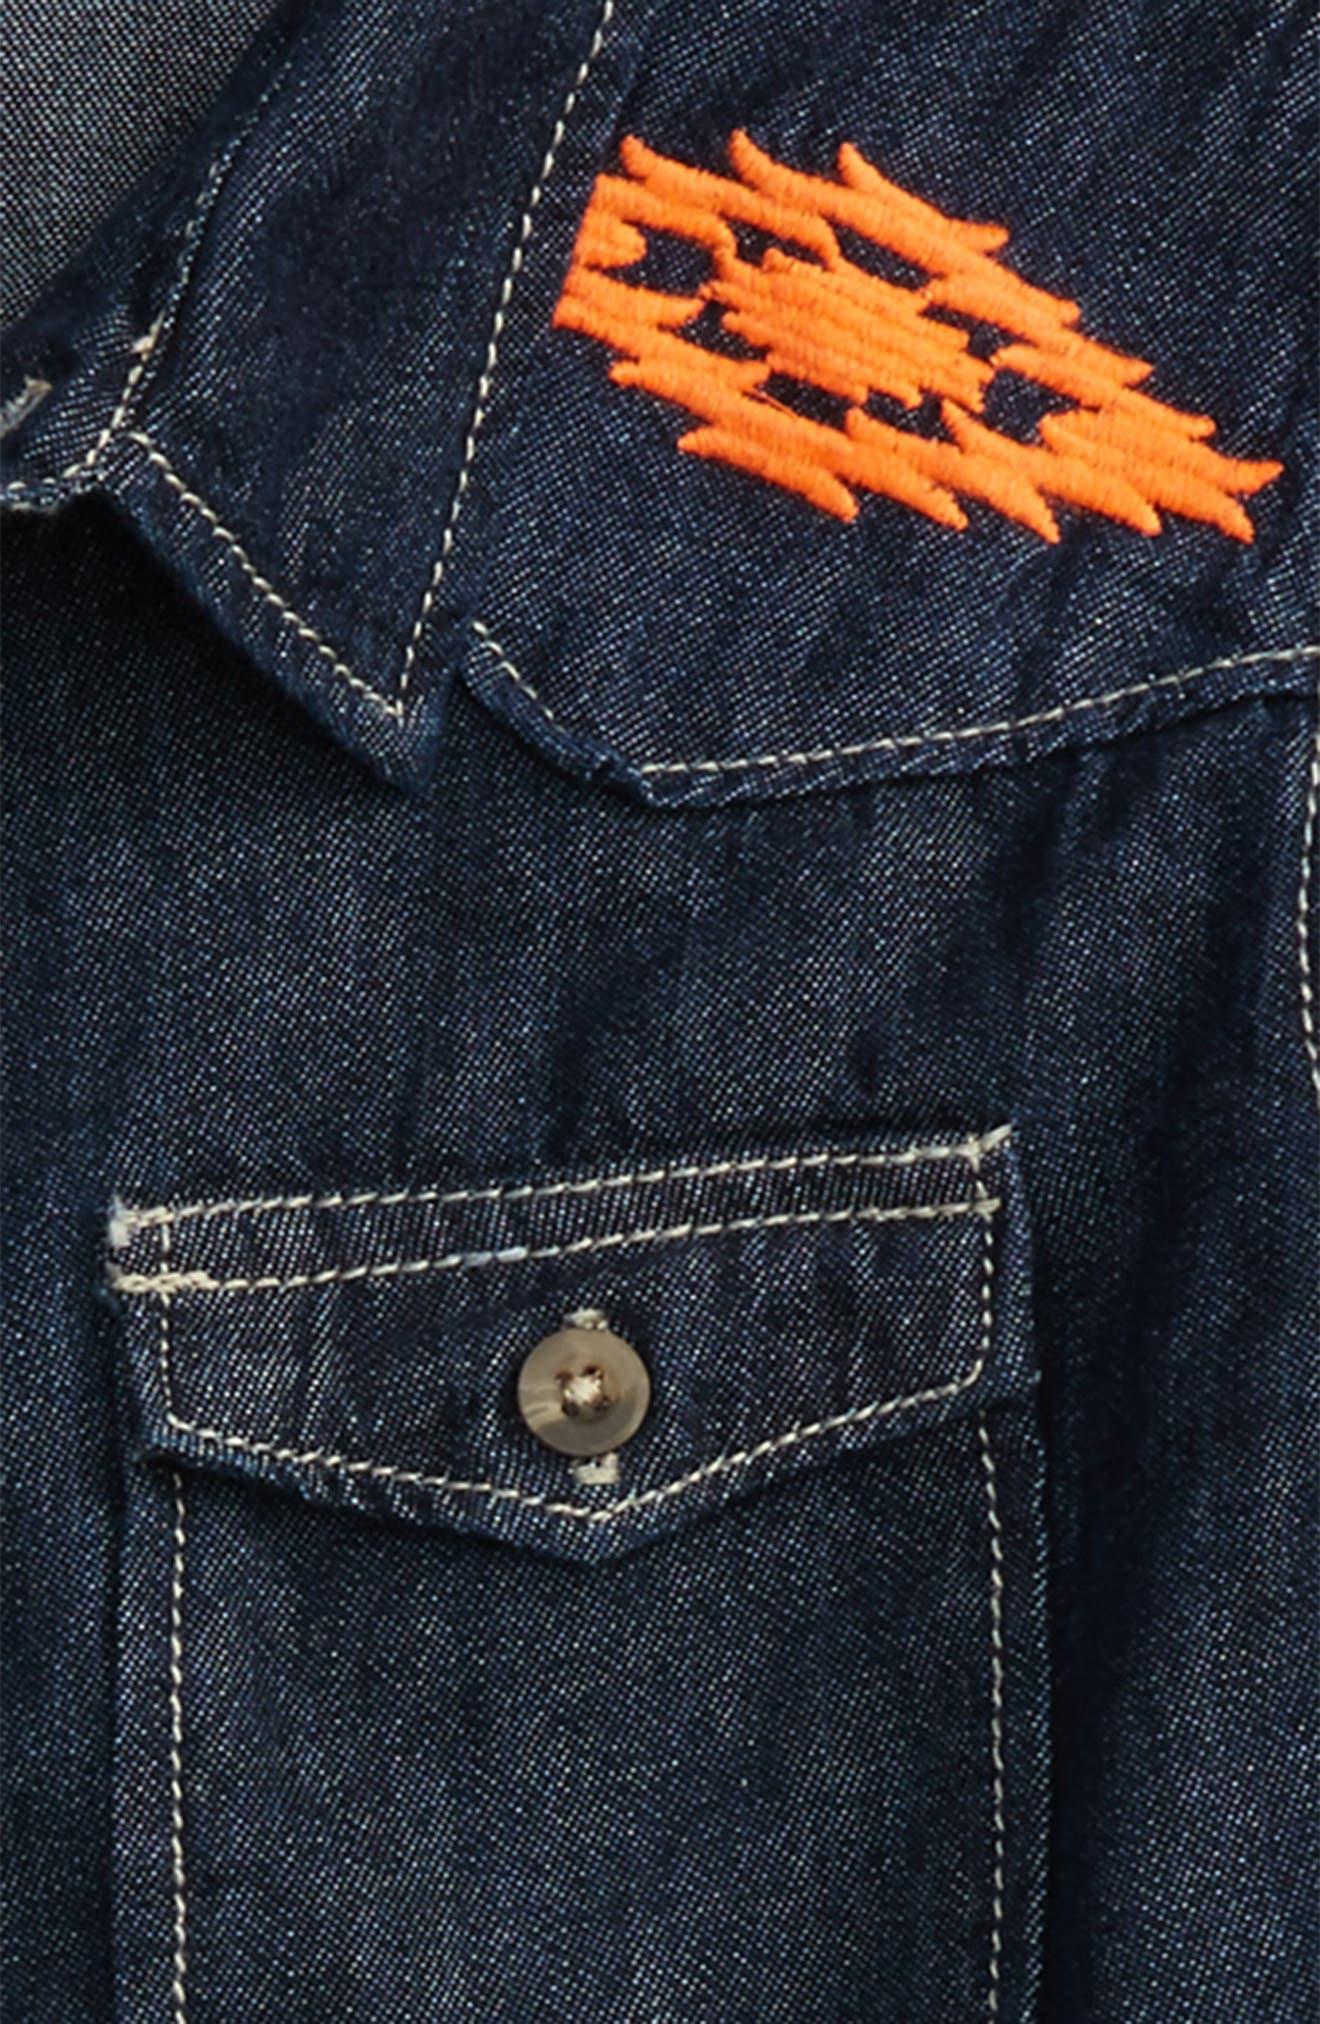 Nash Embroidered Denim Shirt,                             Alternate thumbnail 3, color,                             Indigo